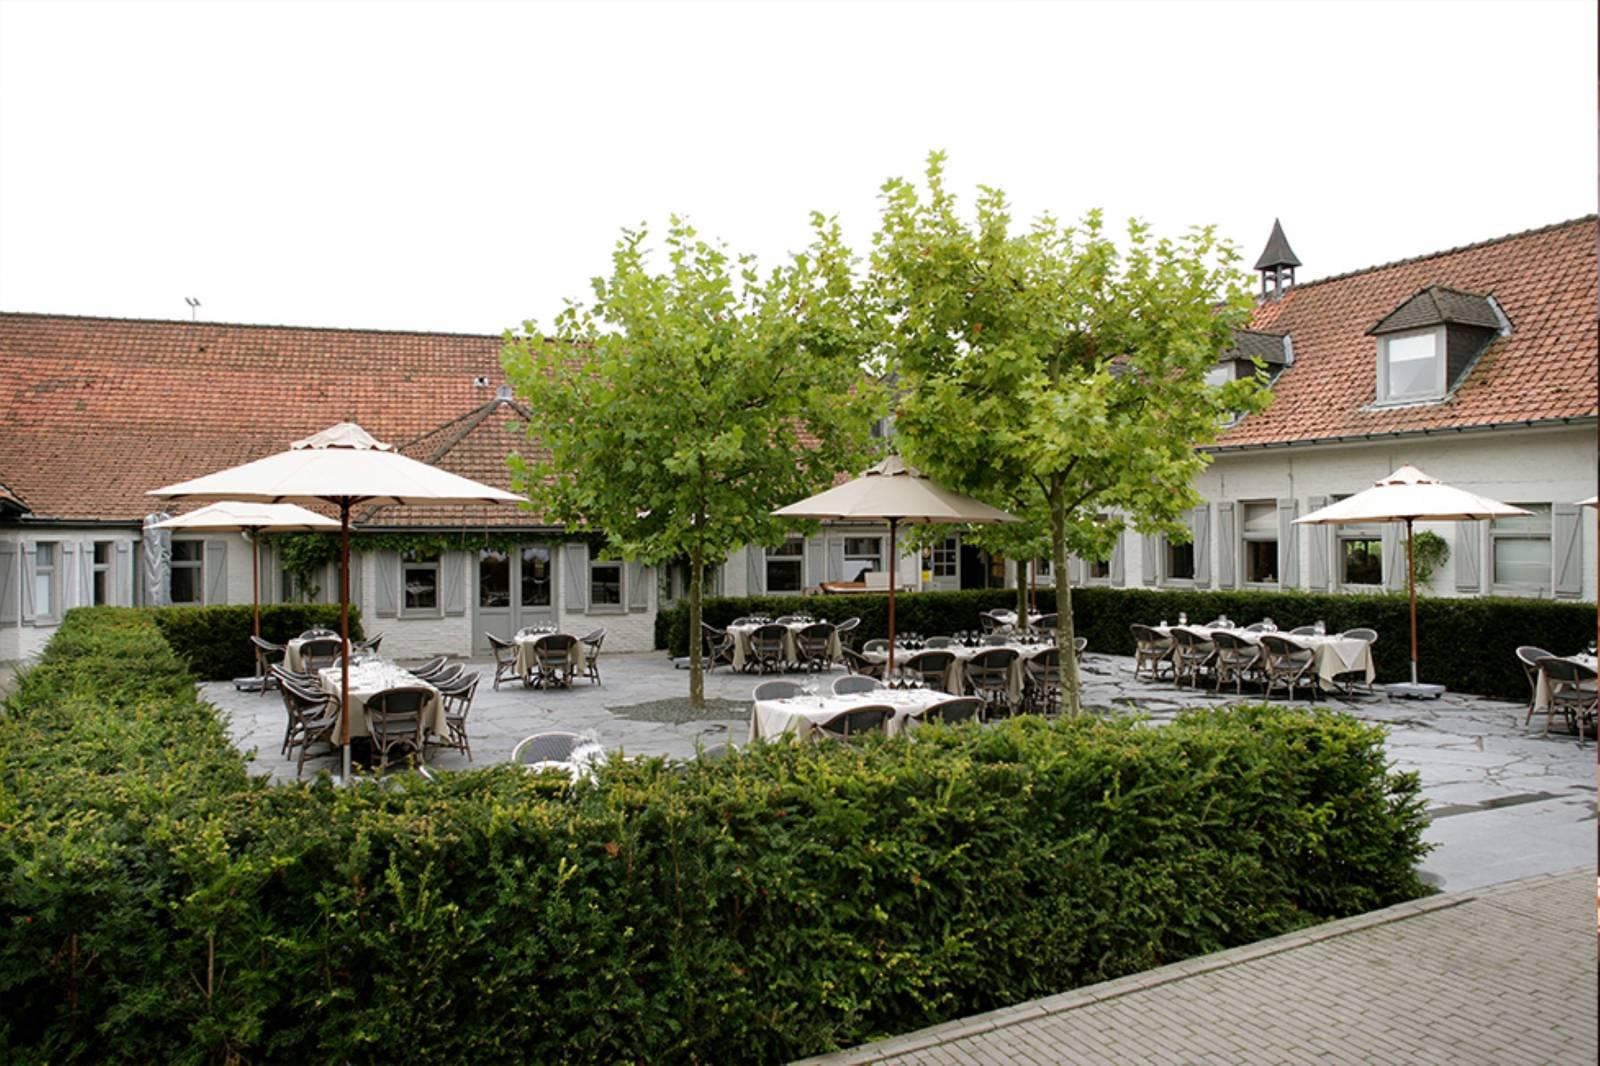 Feestzaal - Klokhof - House of Events(26)